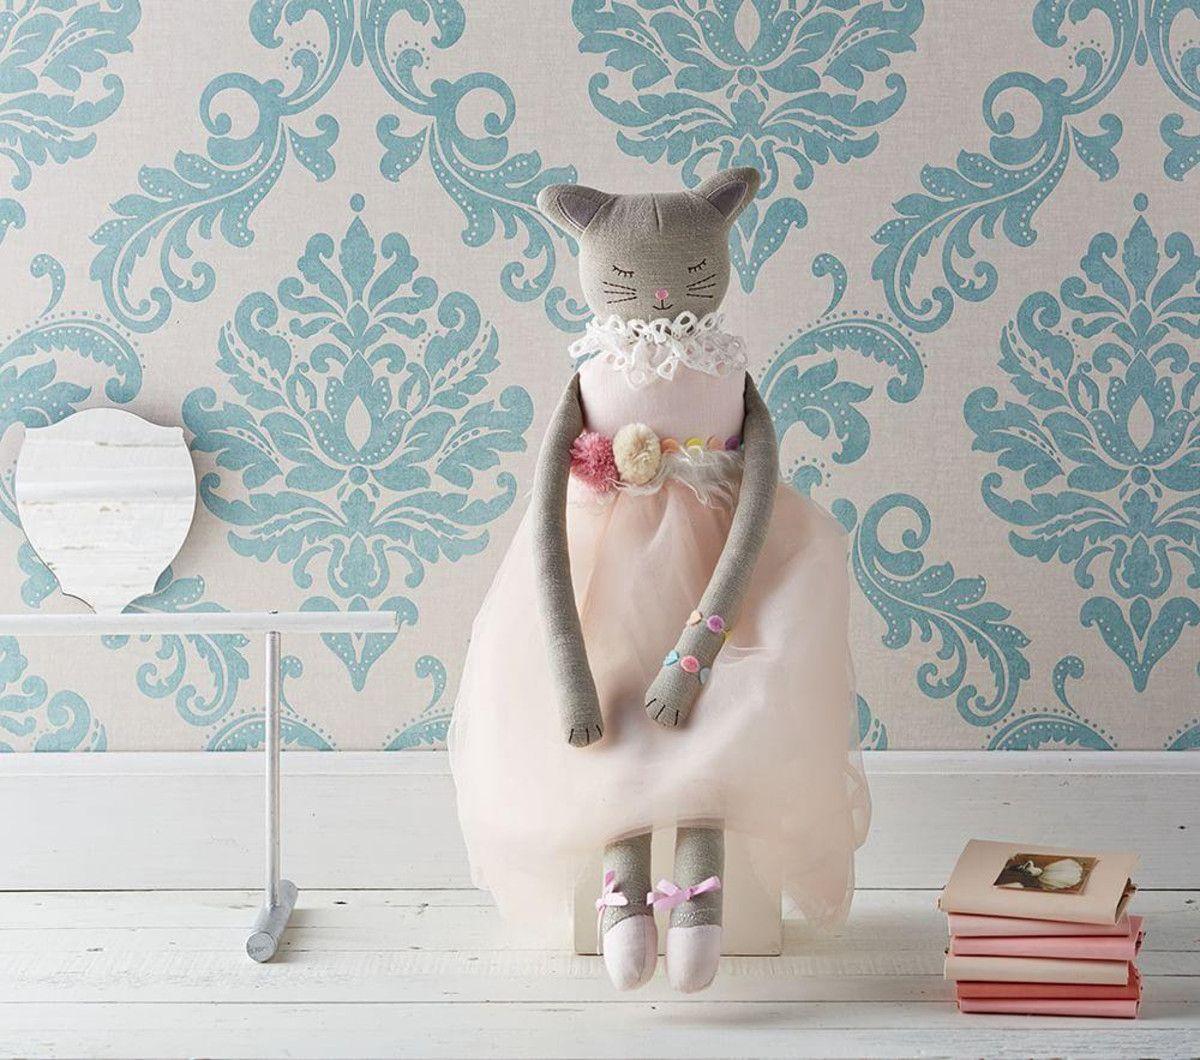 Kitty Designer Doll Chloe | BD sales | Pinterest | Pottery, Barn and ...